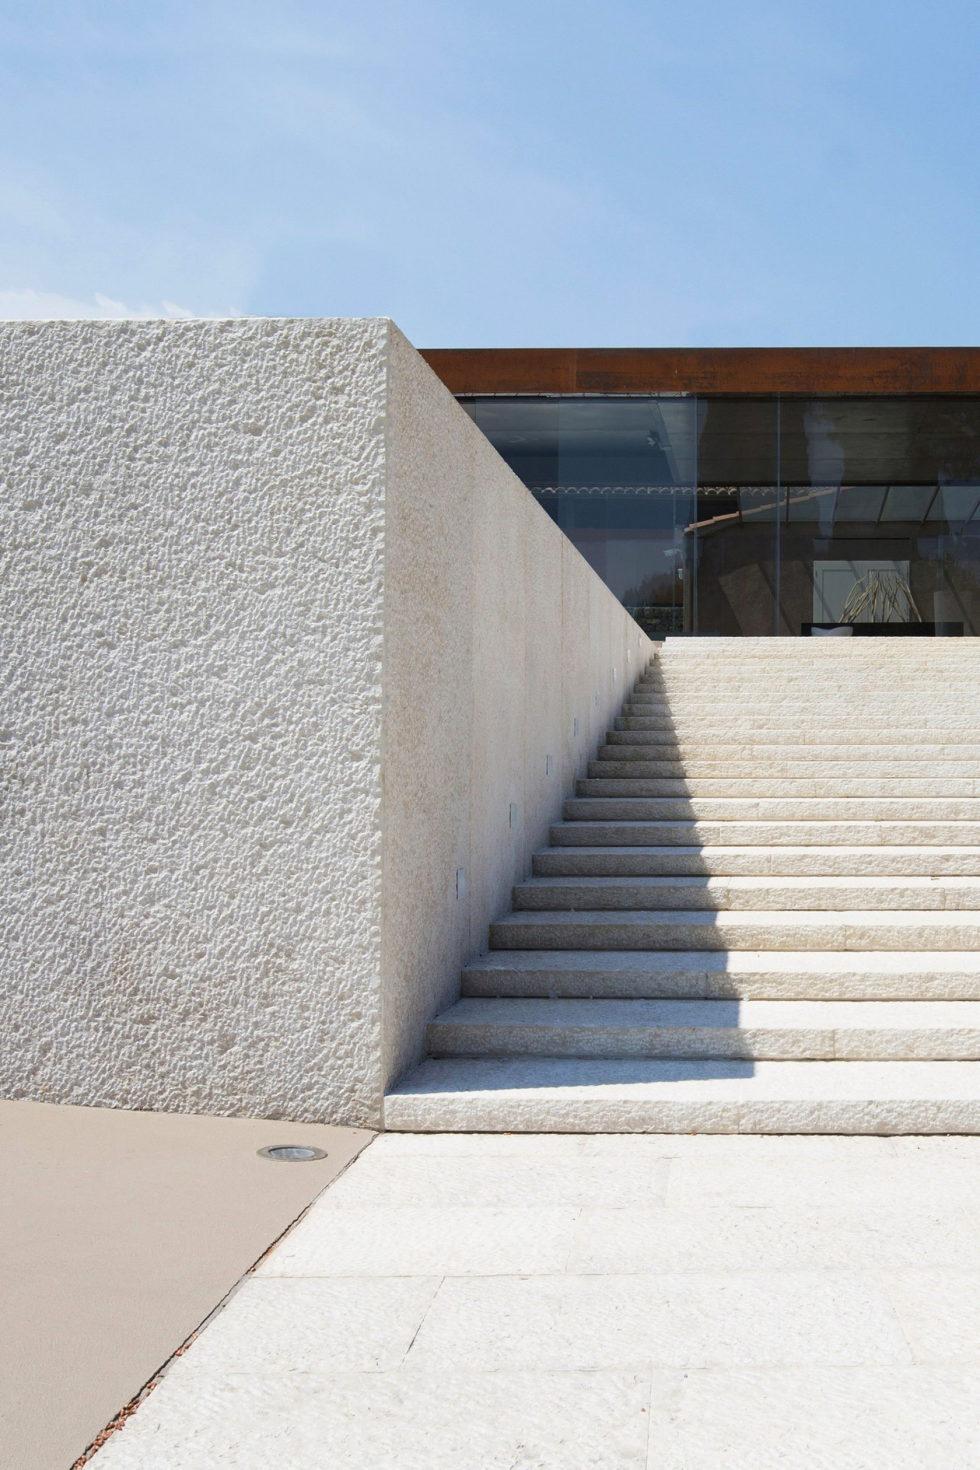 CRV Villa In Italy From ACA Amore Campione Architettura 9